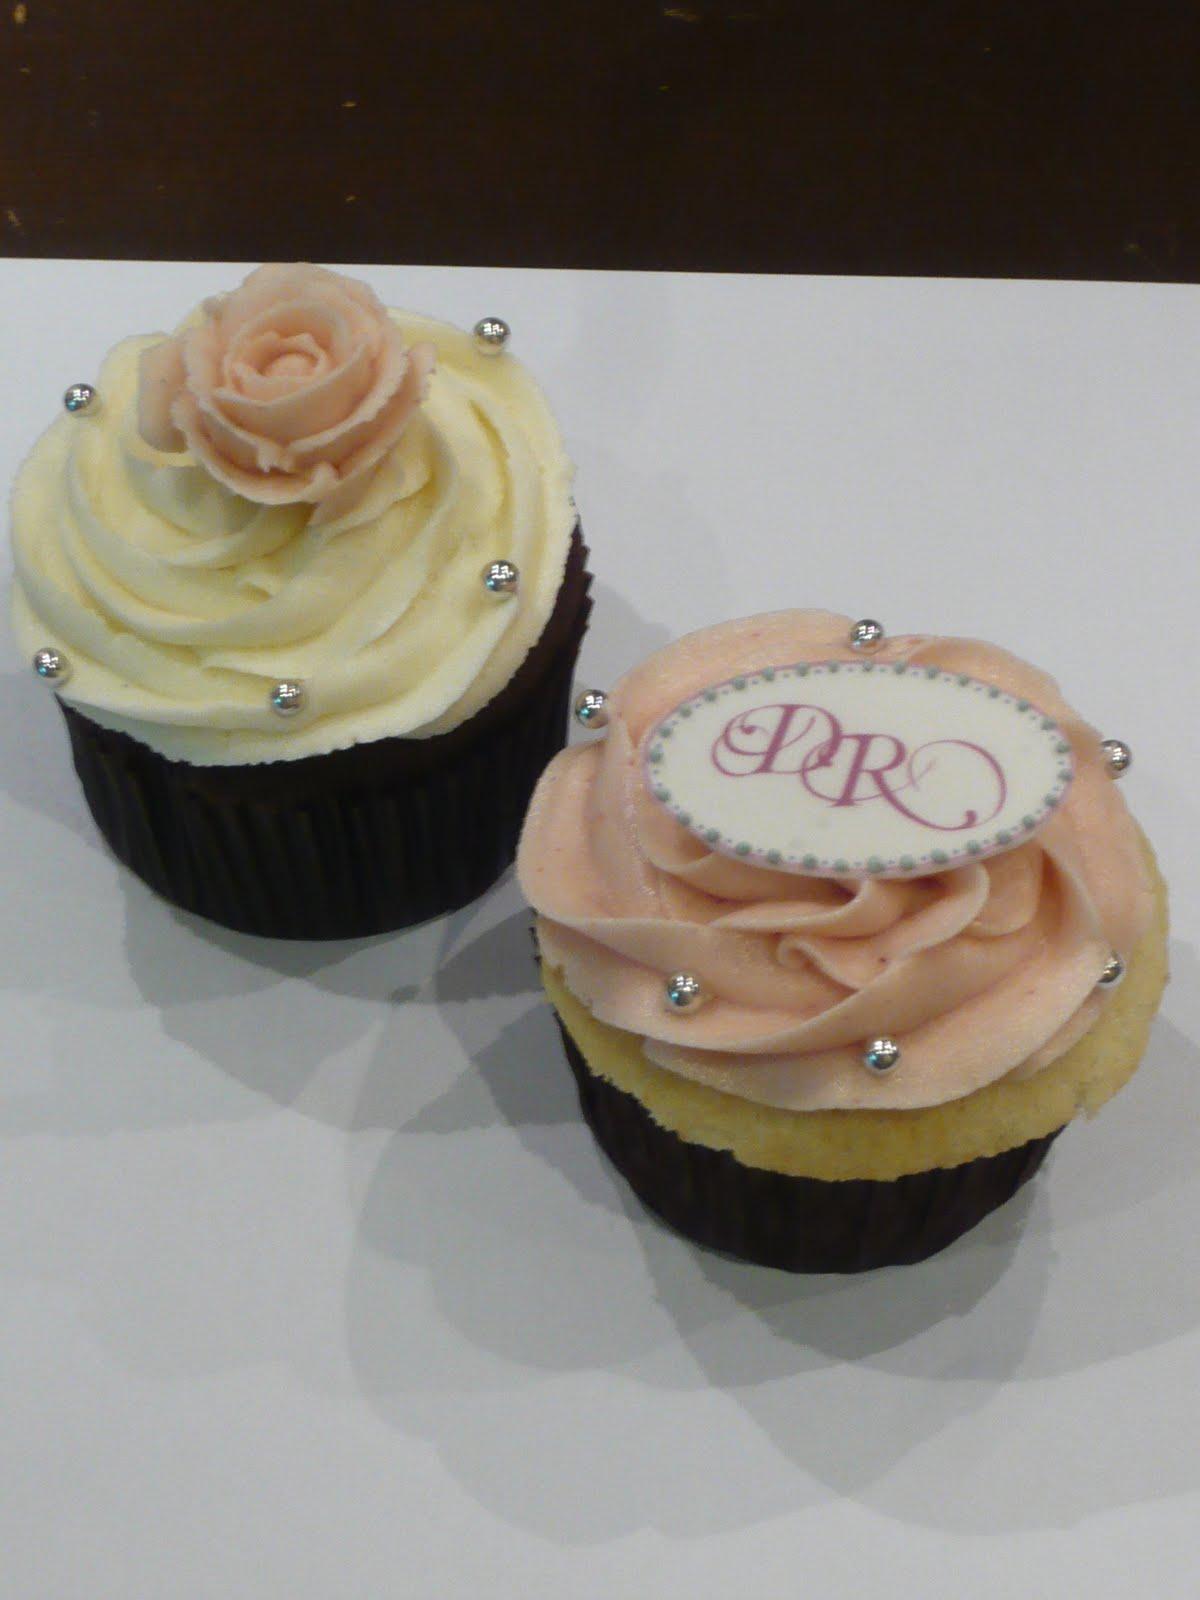 Sift: Customized wedding cupcakes